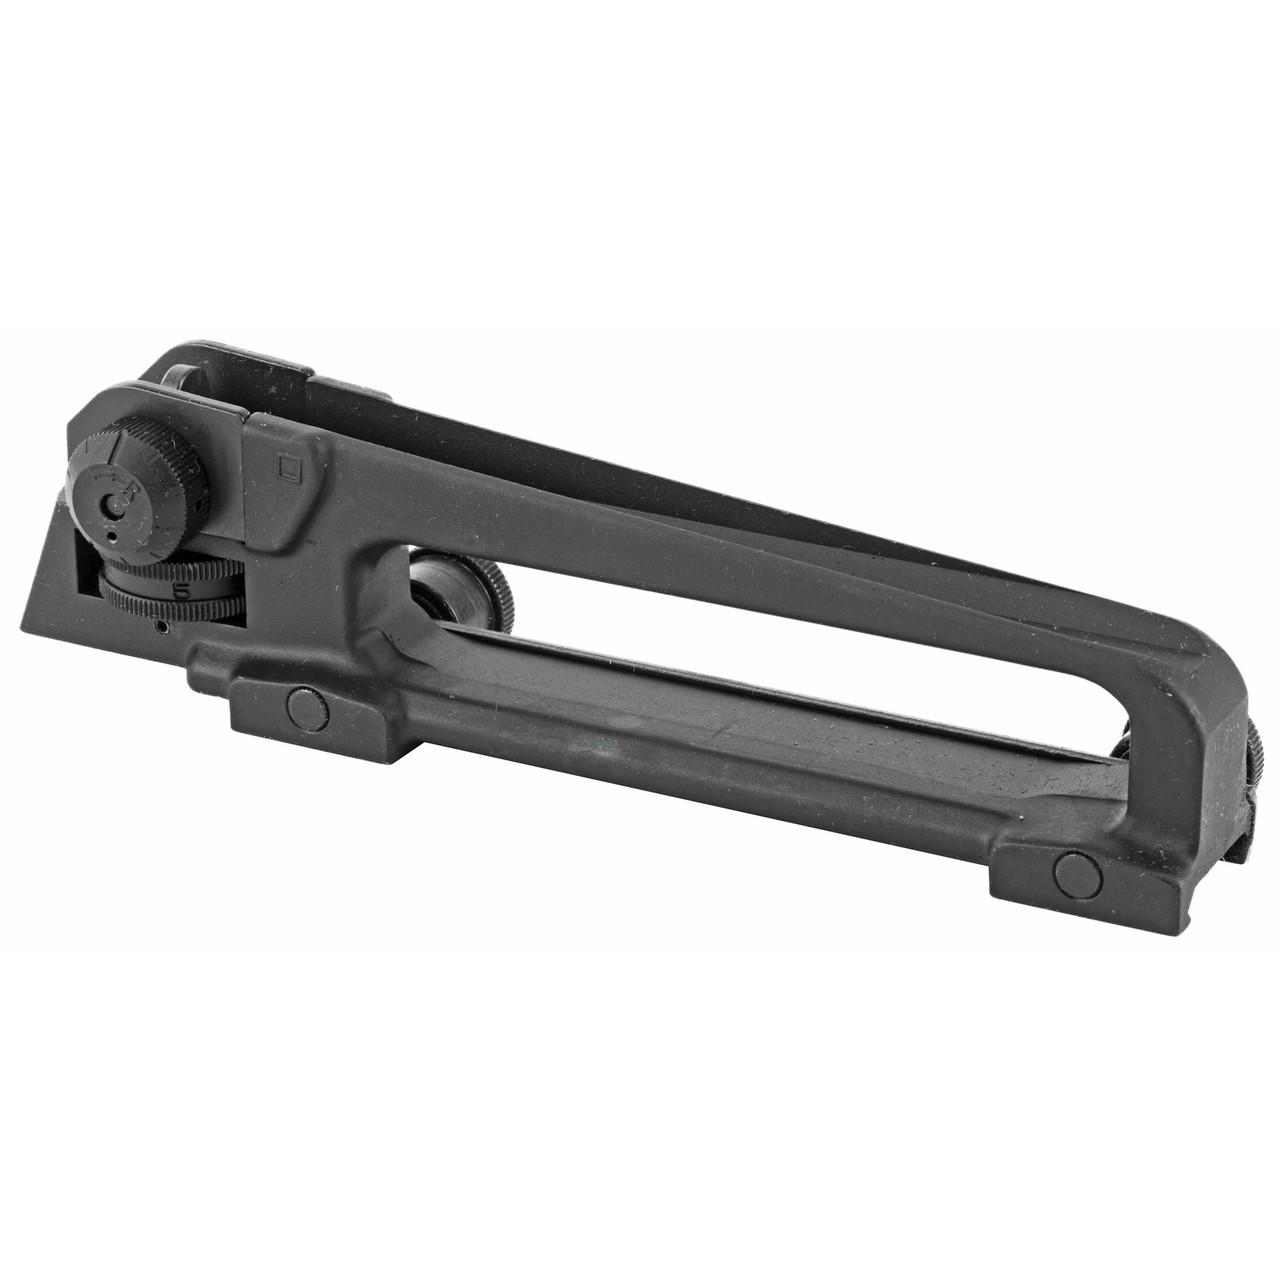 Luth-AR Detachable Carry Handle Mil-Spec